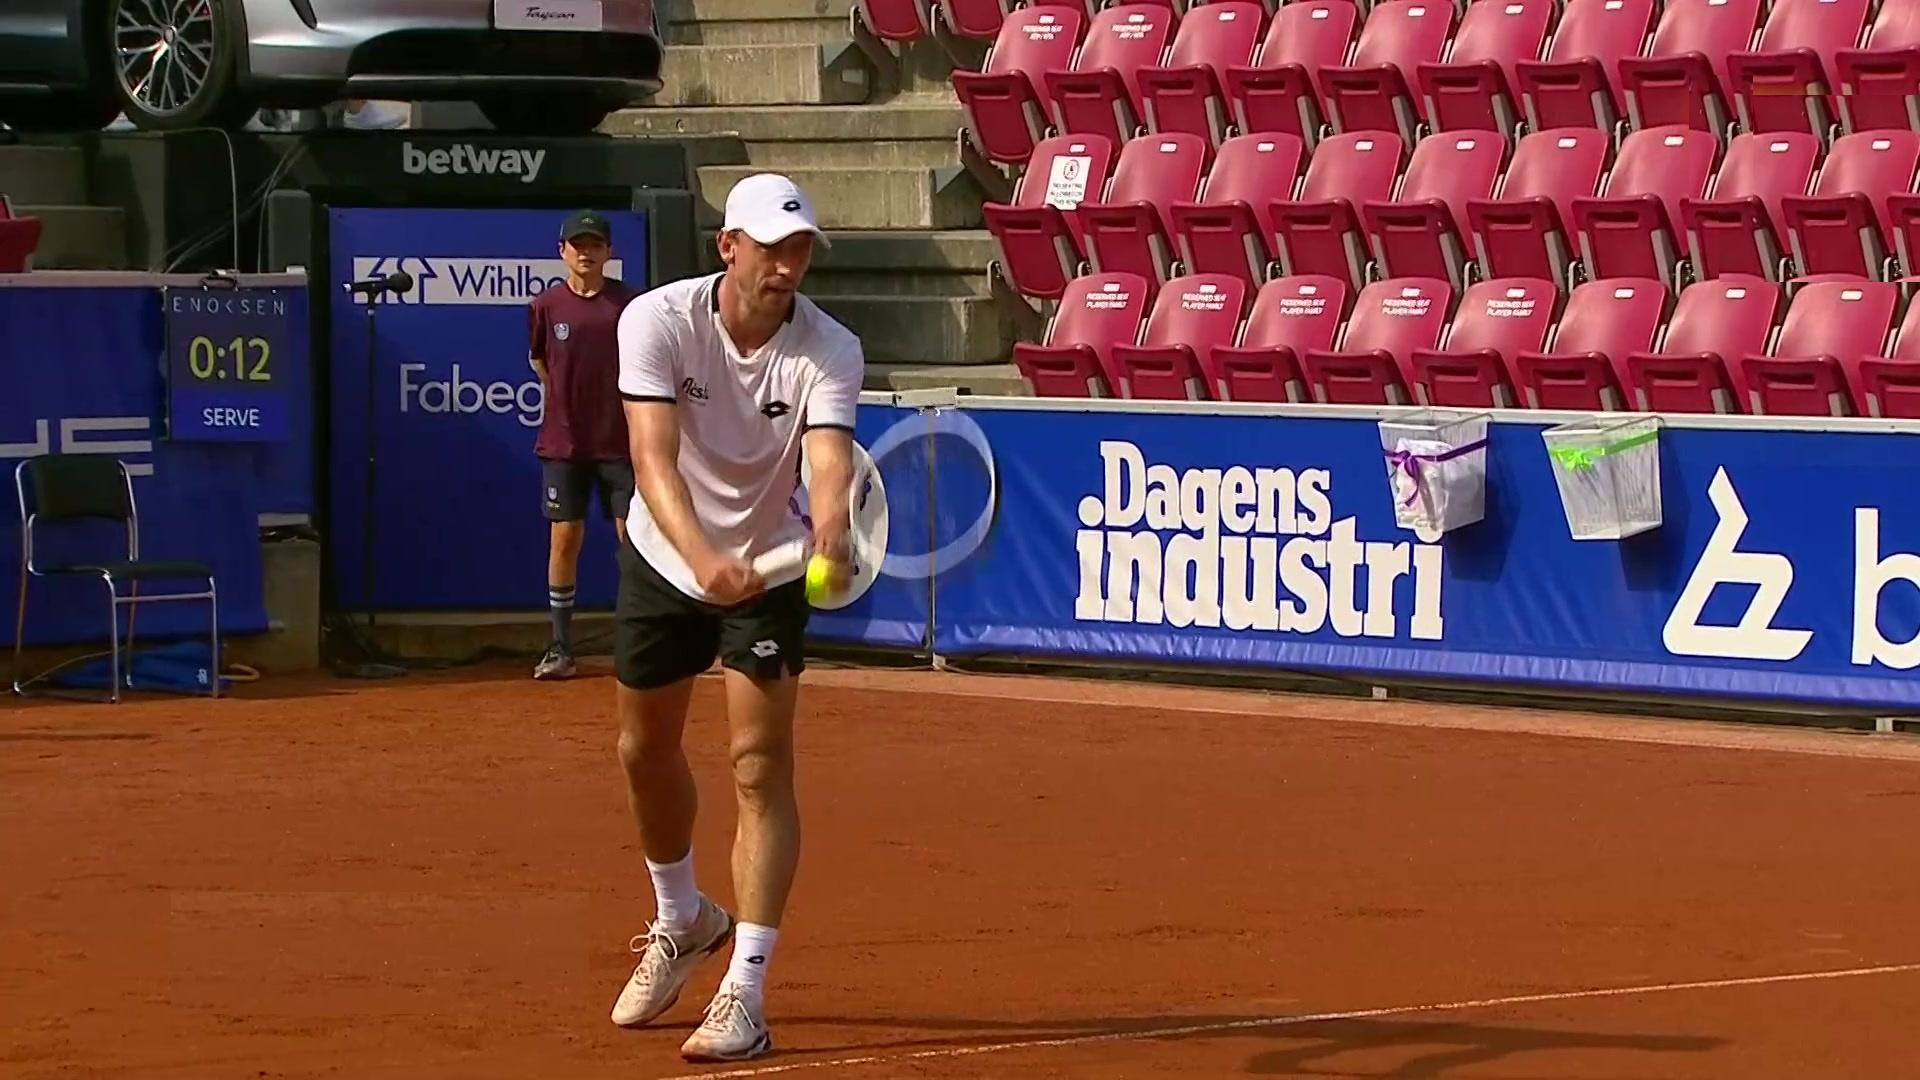 ATP 250 Torneo Bastad: Rinderknech - Millman